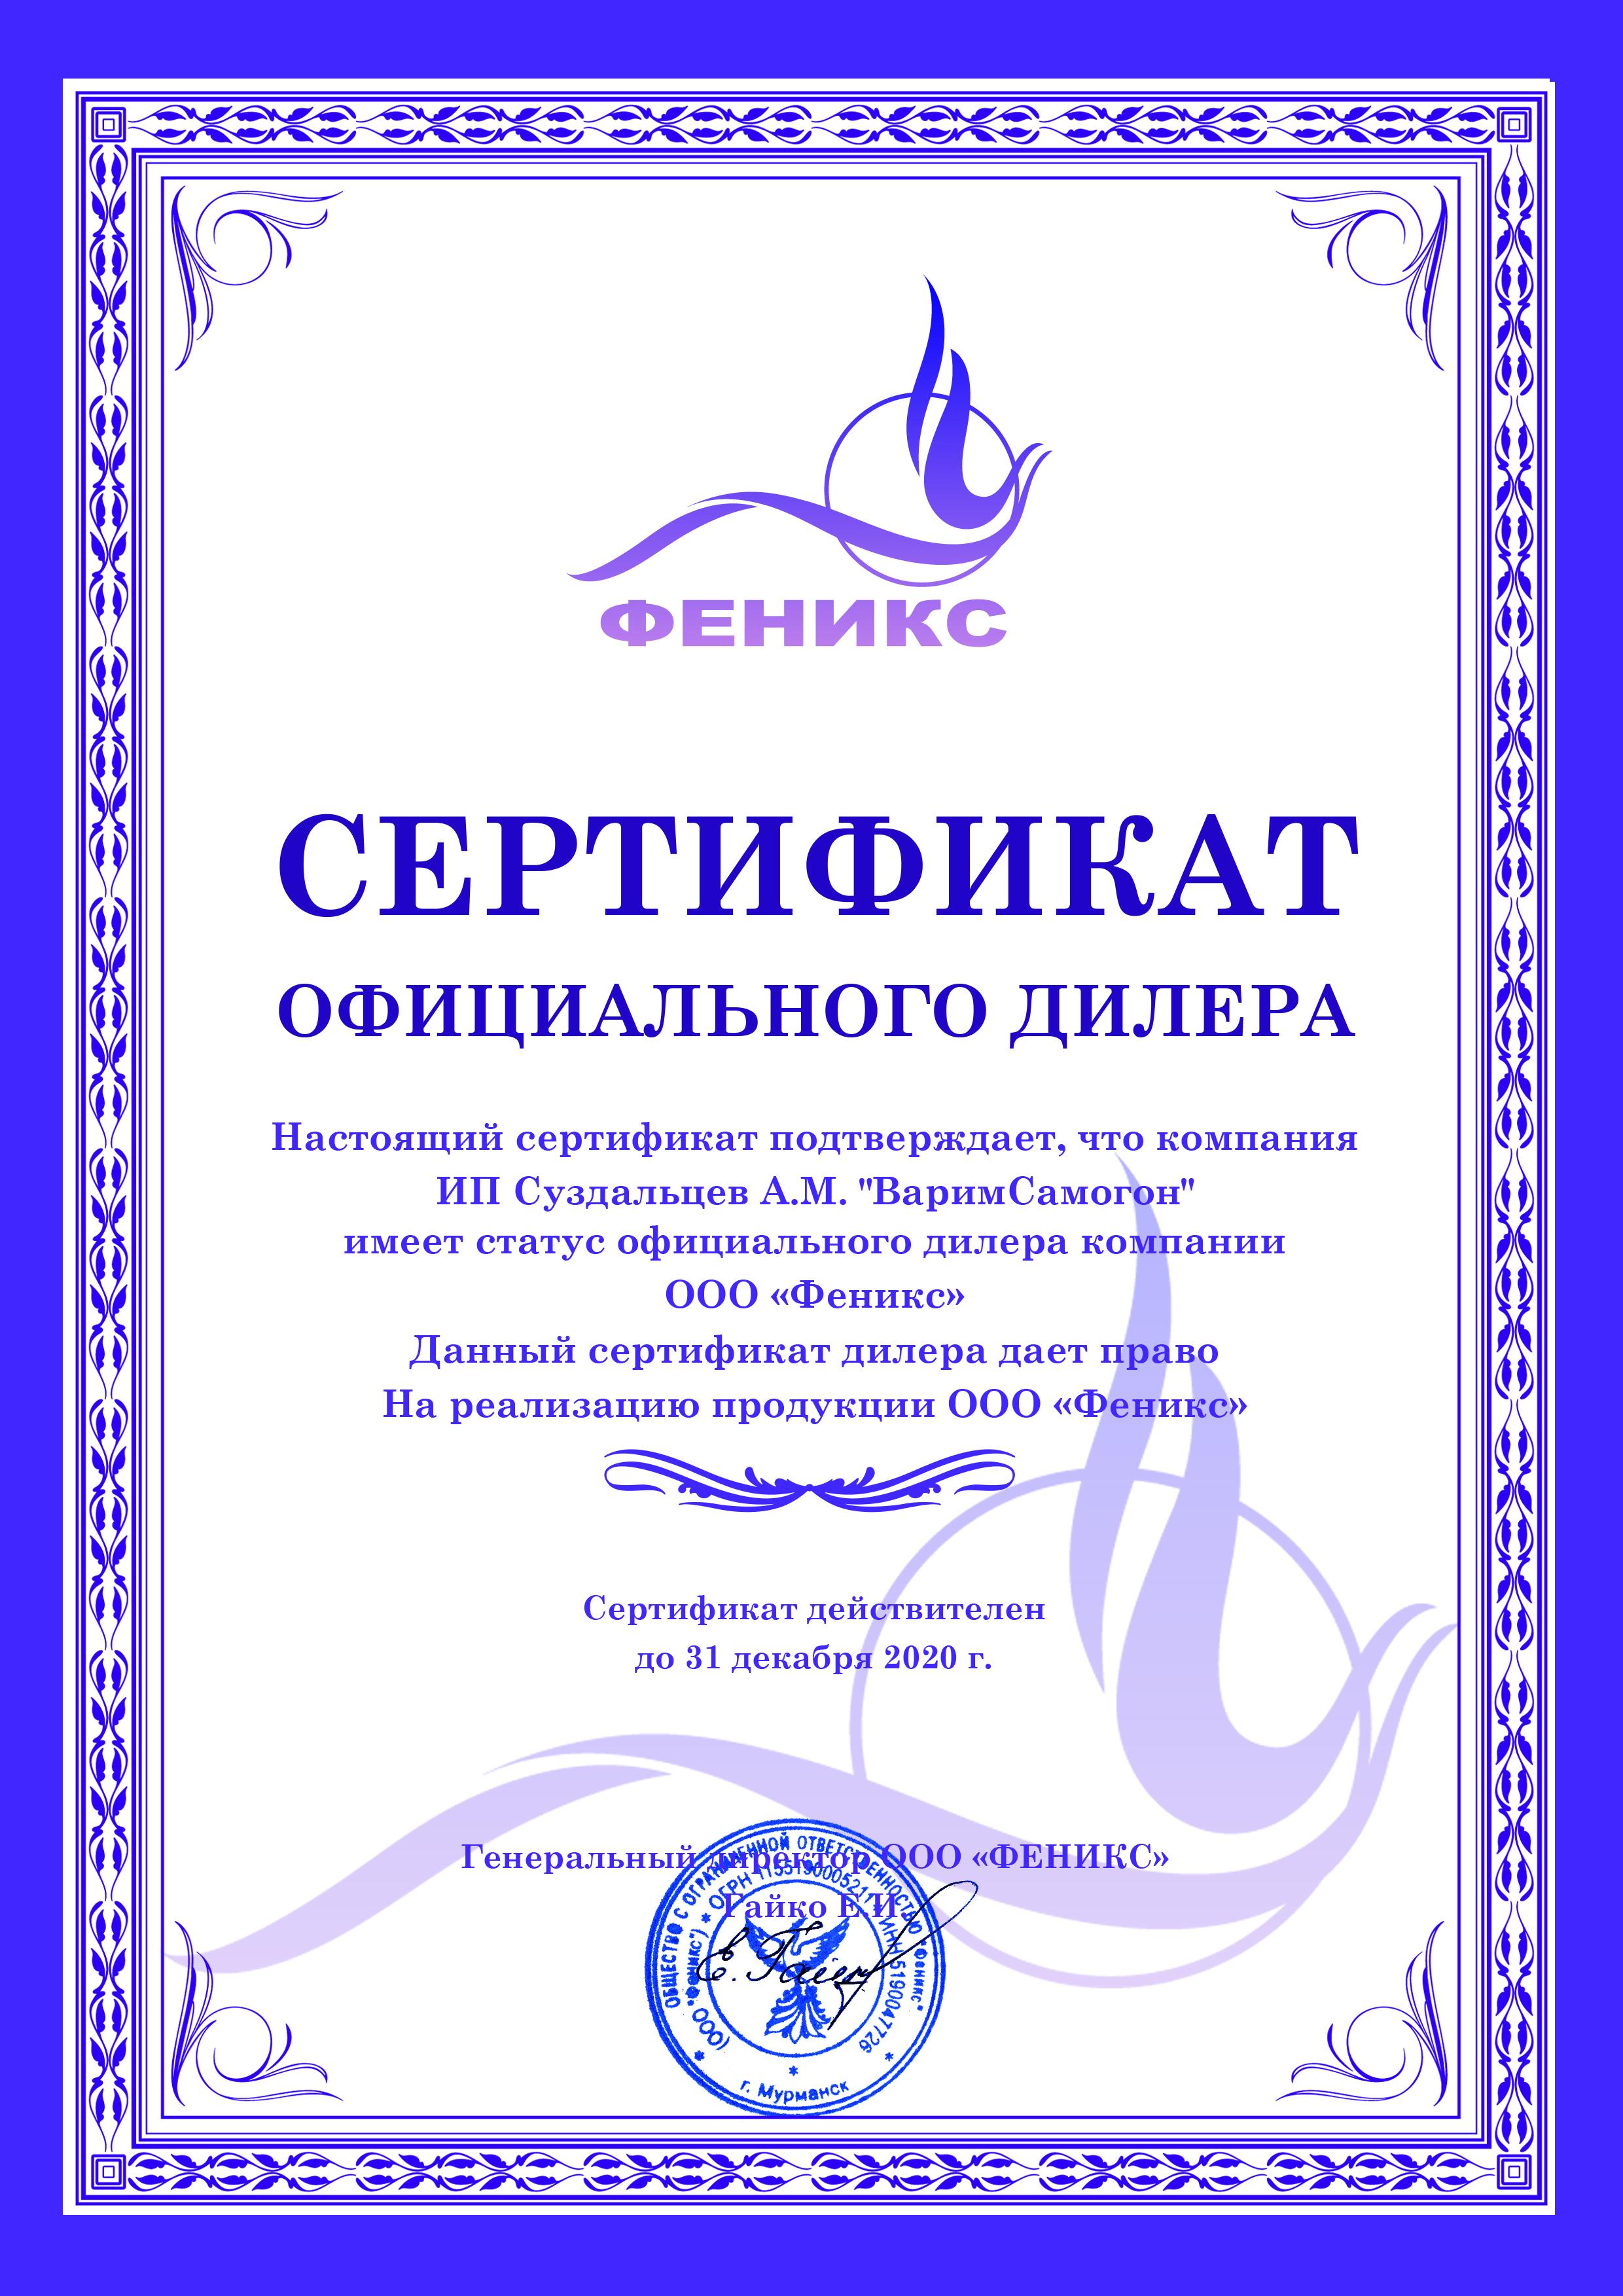 Сертификат Феникс